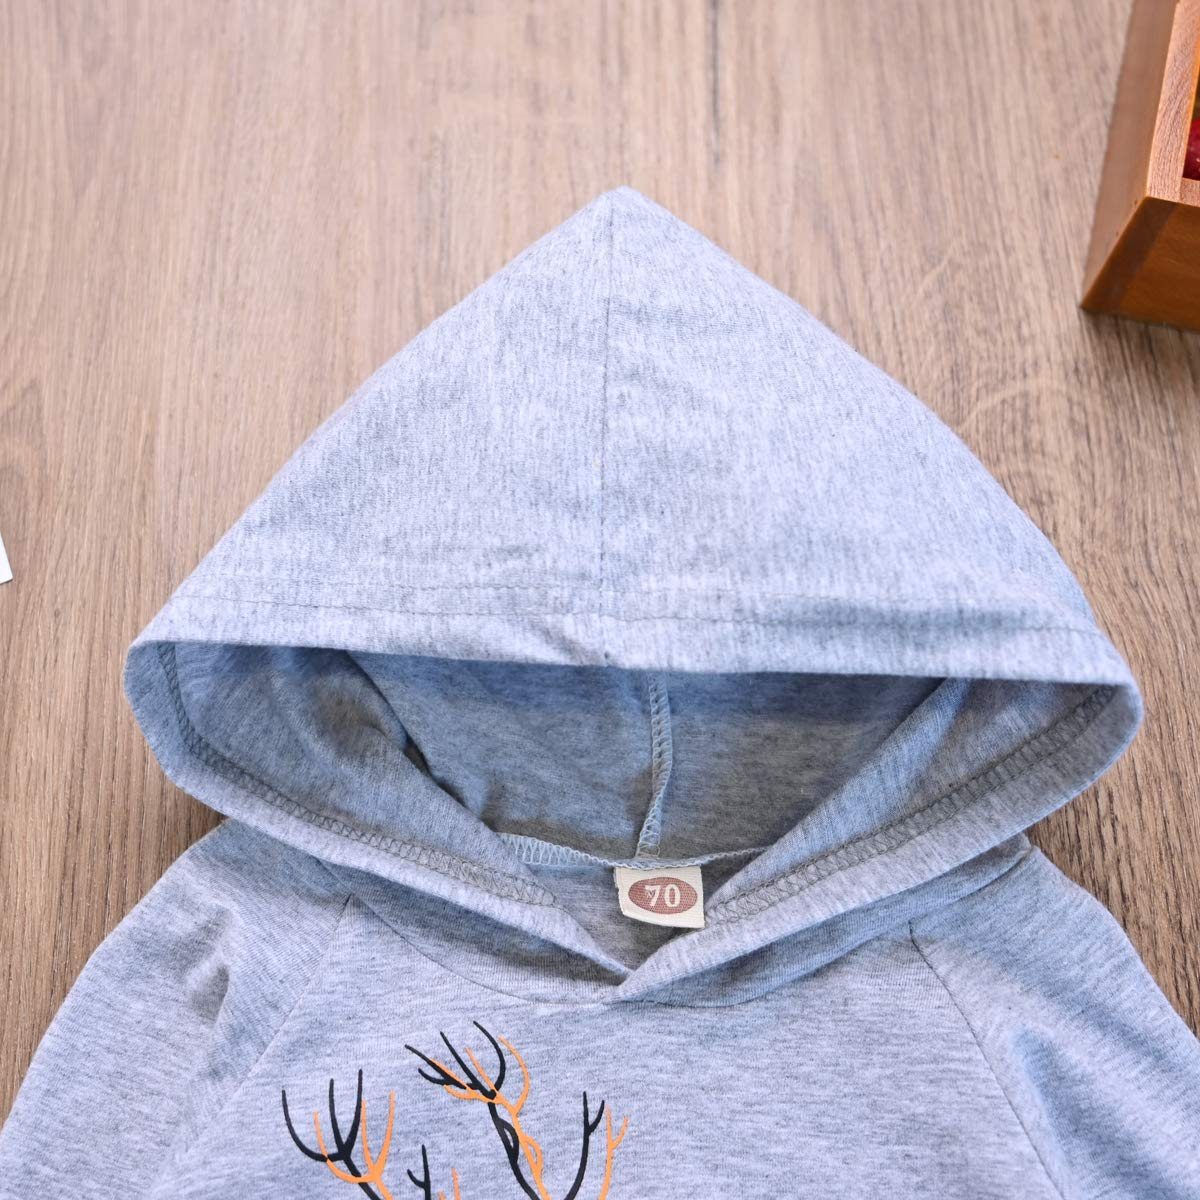 BEDHRT Baby Boy Girl Clothes Long Sleeve Xmas Hoodies Sweatshirt Top Deer Pants Trouser Cute Outfit Tracksuits Sets